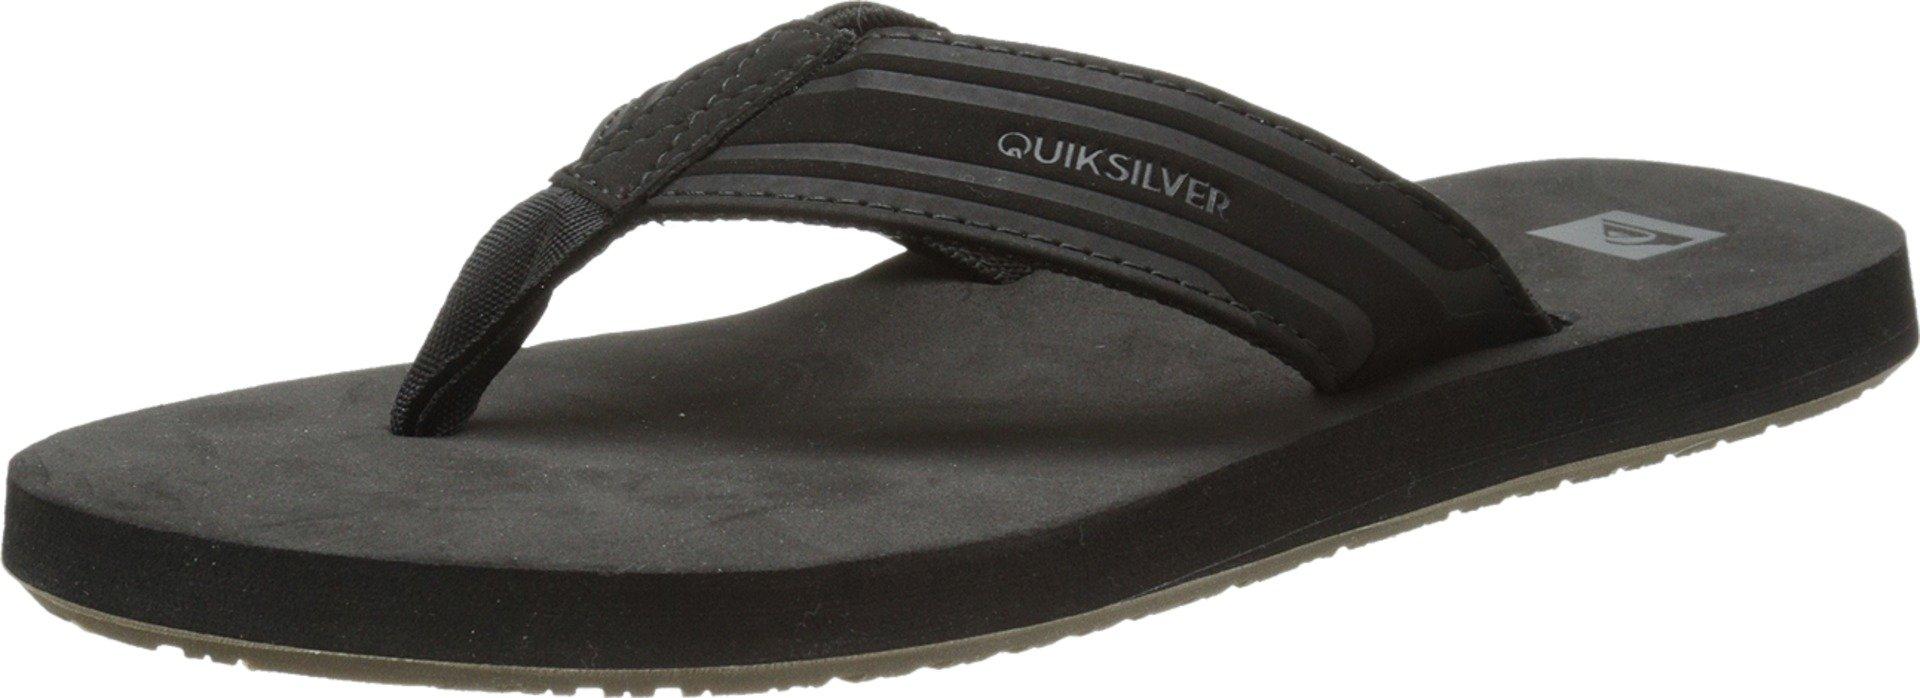 Quiksilver Men's Monkey Wrench 3 Point Sandal, Black/Black/Brown, 9 M US